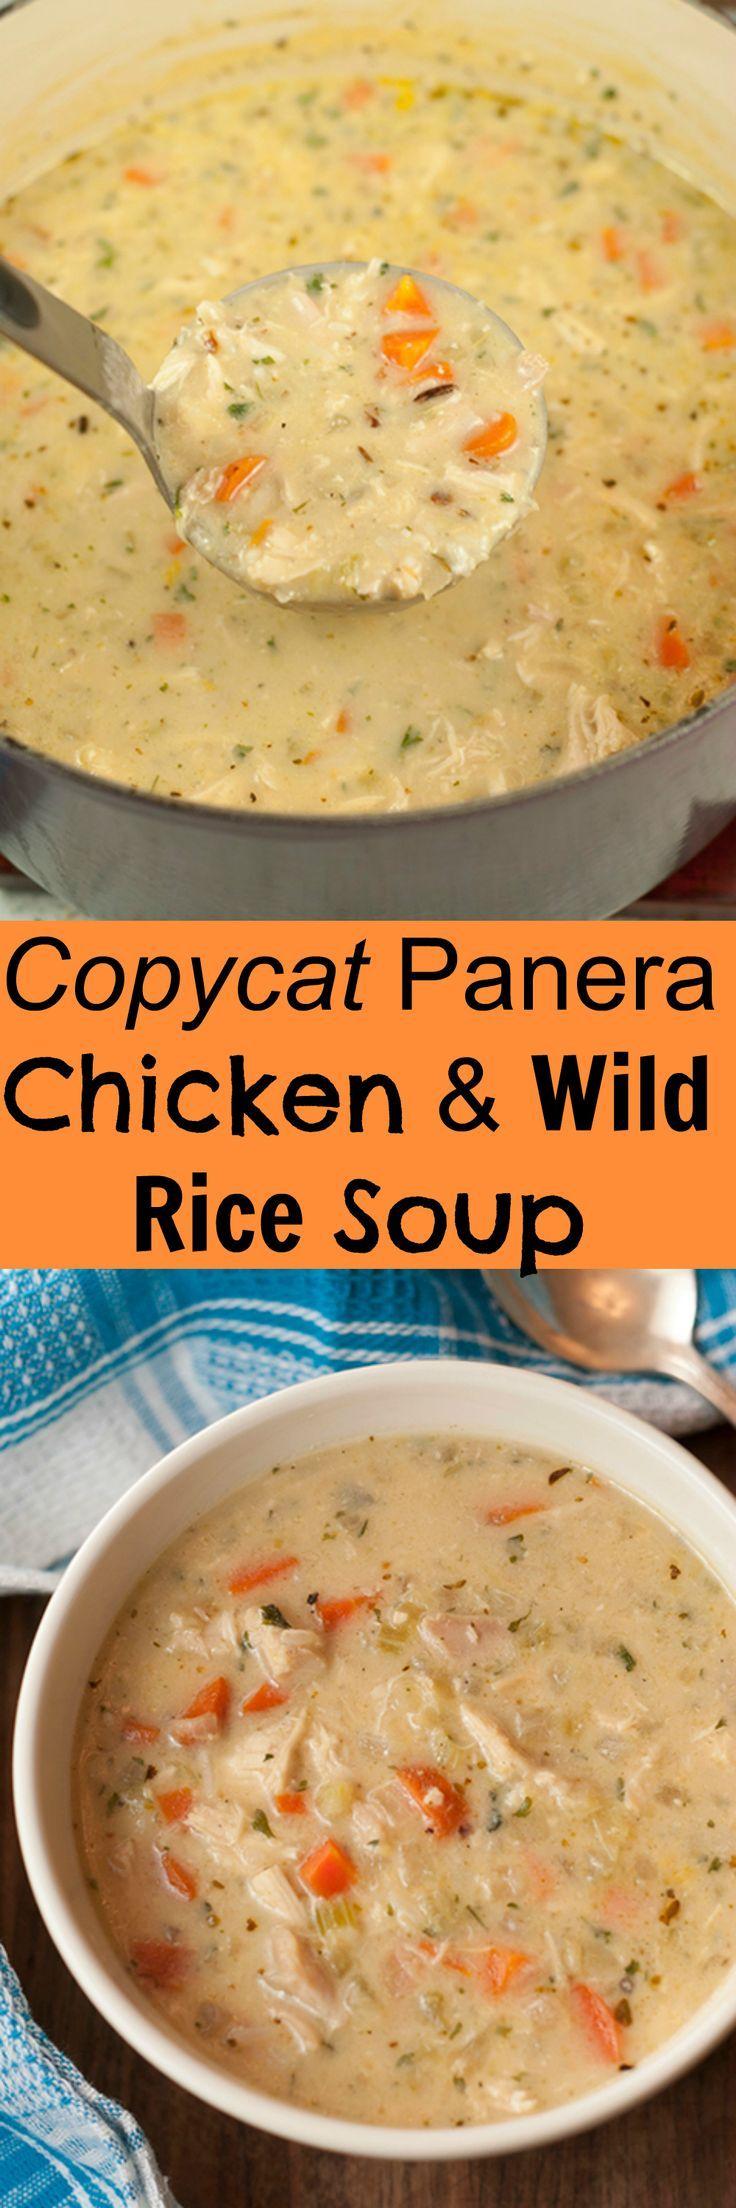 Copycat Panera Chicken